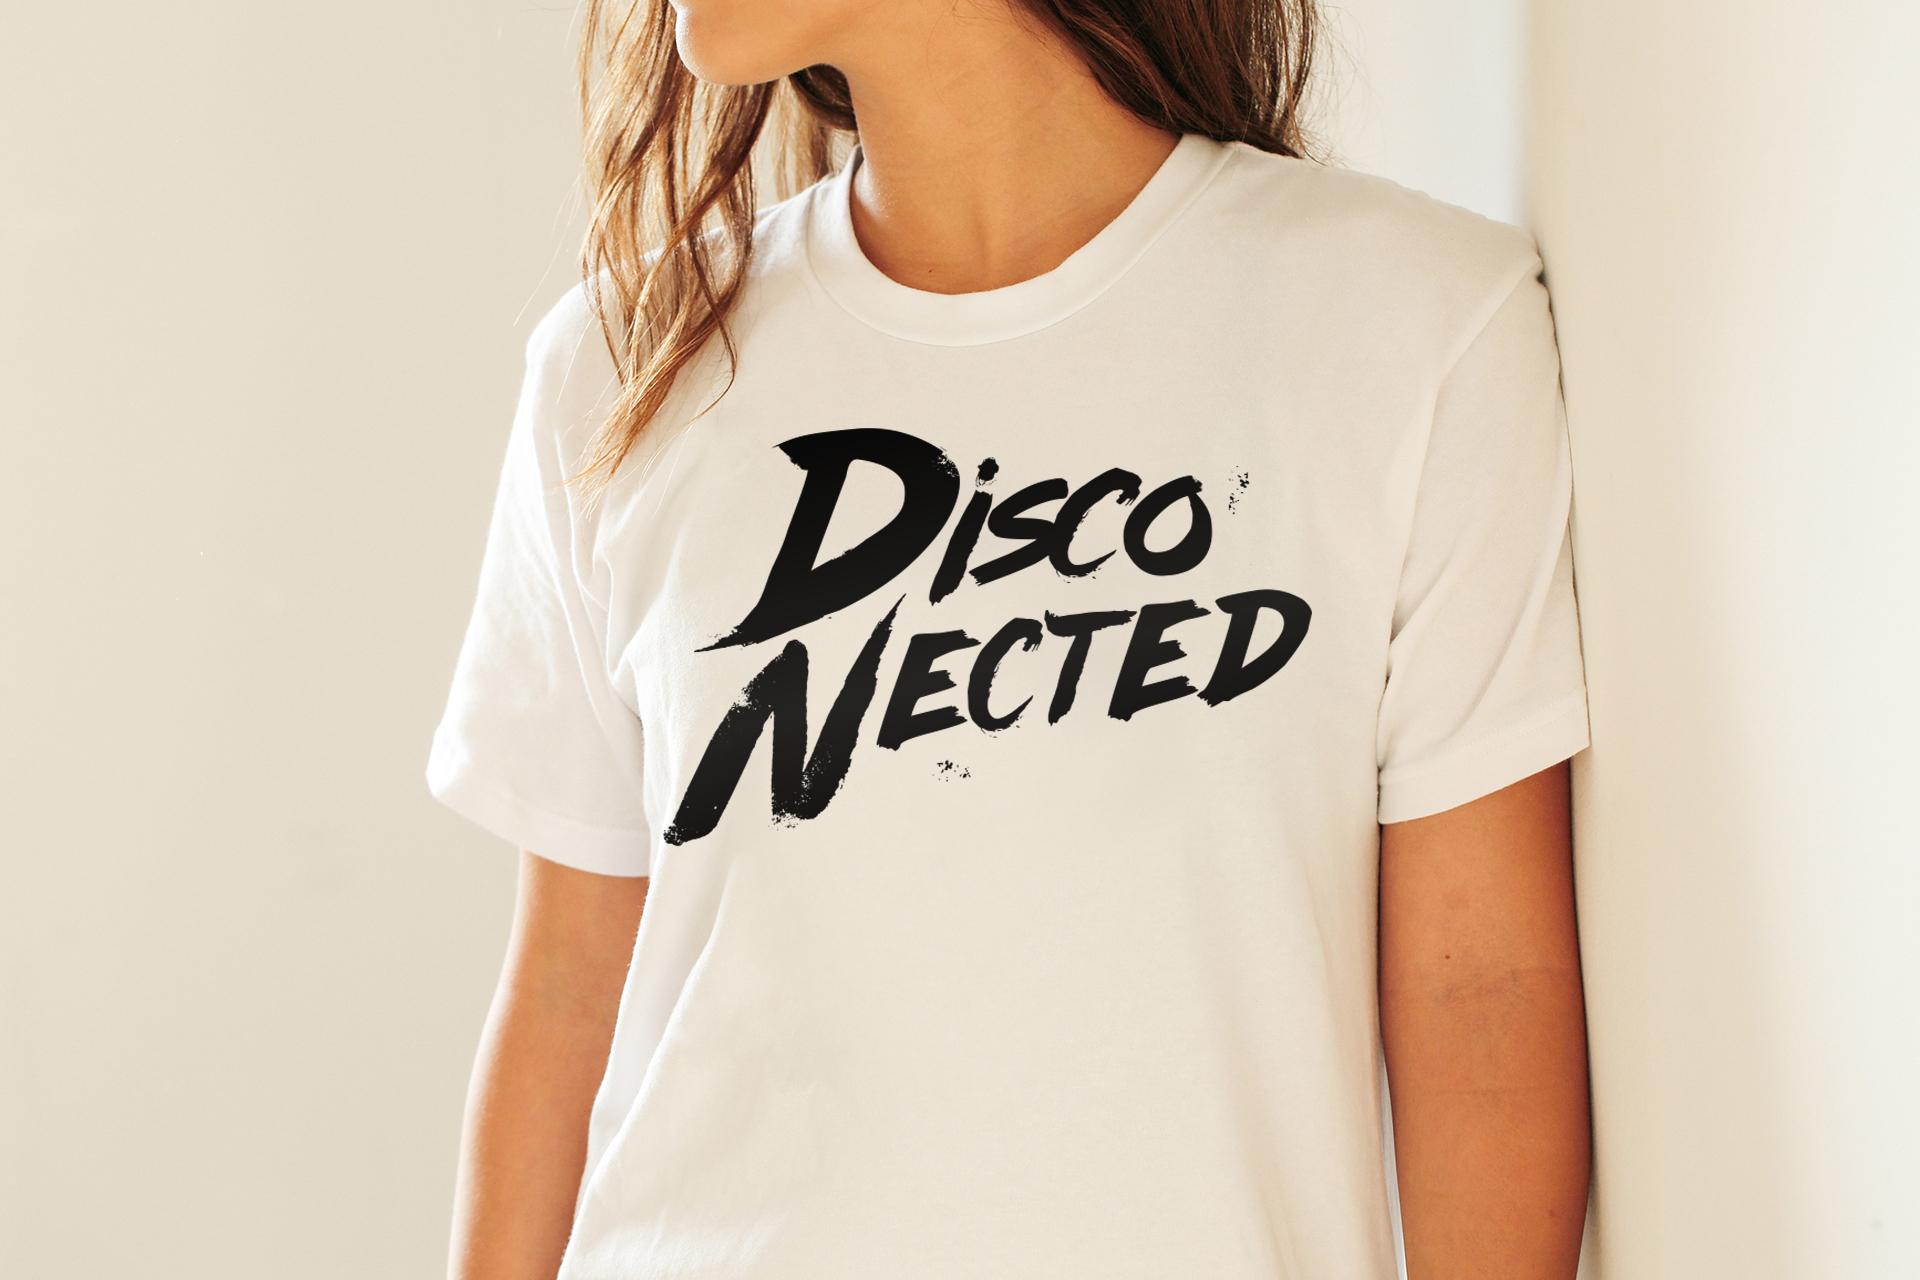 T-SHIRT DISCO-NECTED UNISEX